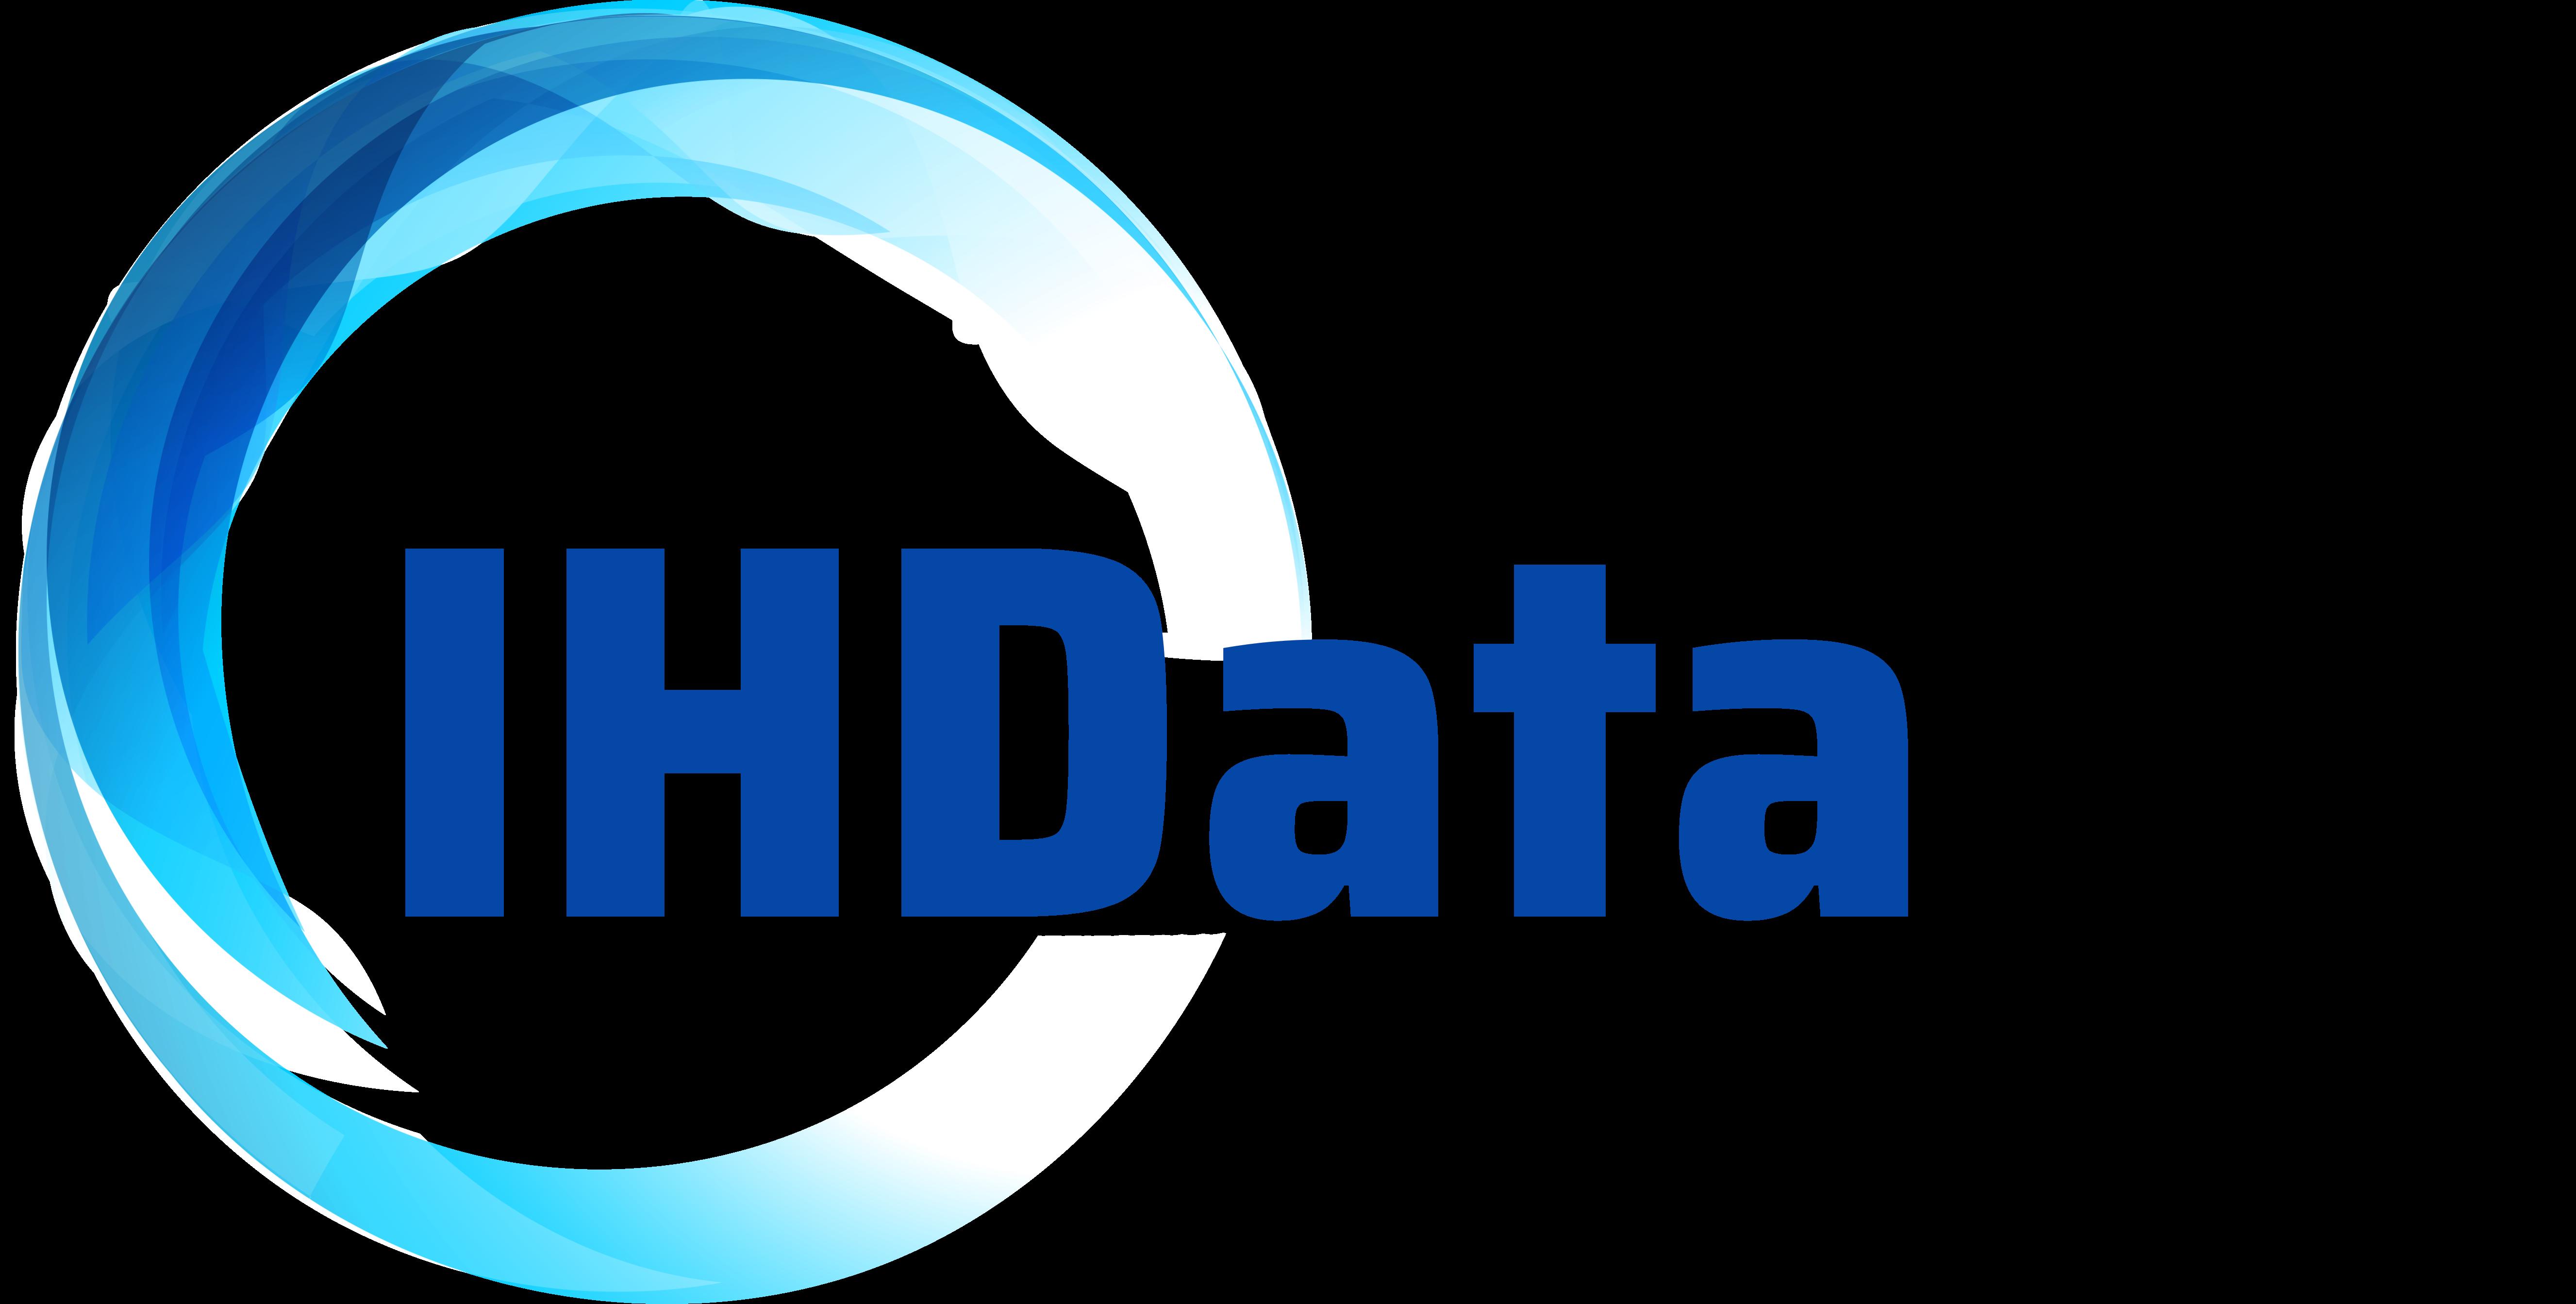 IHData